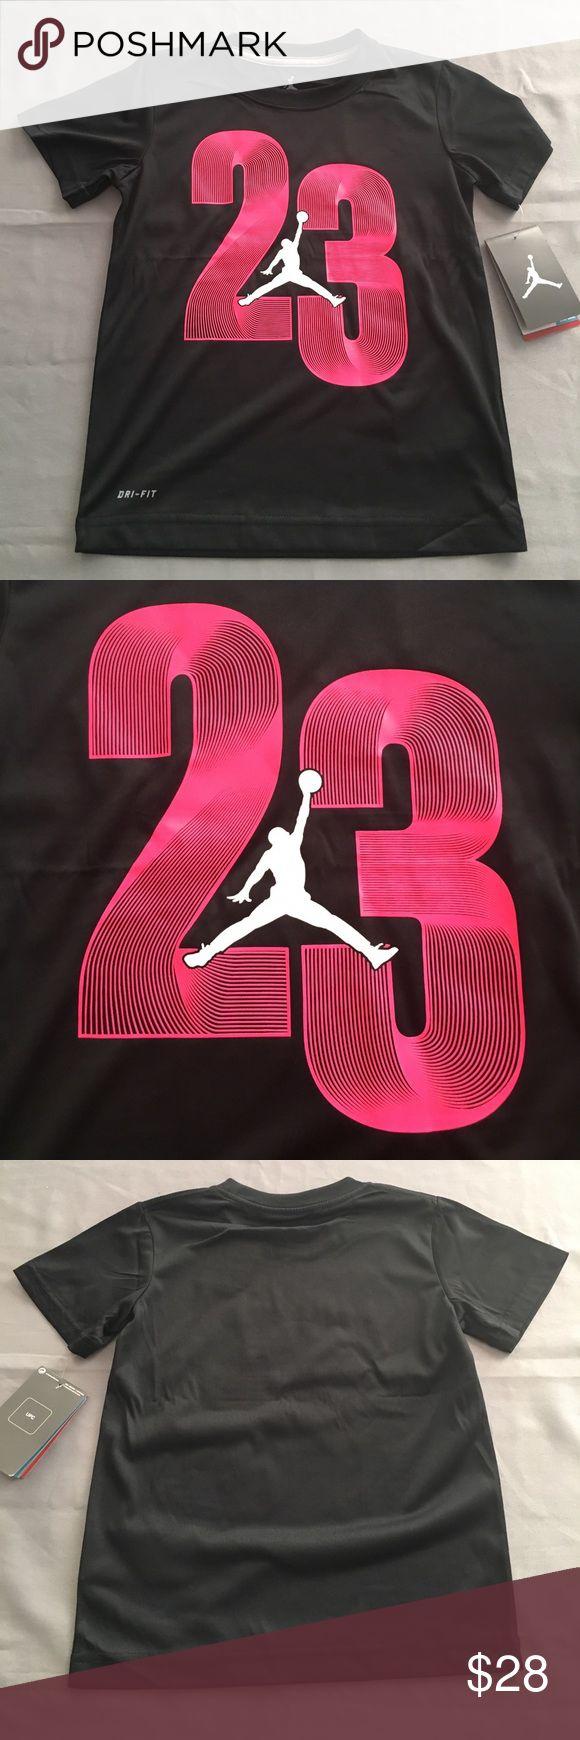 NWT Nike Michael Jordan Dri-Fit T Shirt NWT Nike Michael Jordan Dri-Fit T Shirt. Black, pink and white. Nike Shirts & Tops Tees - Short Sleeve